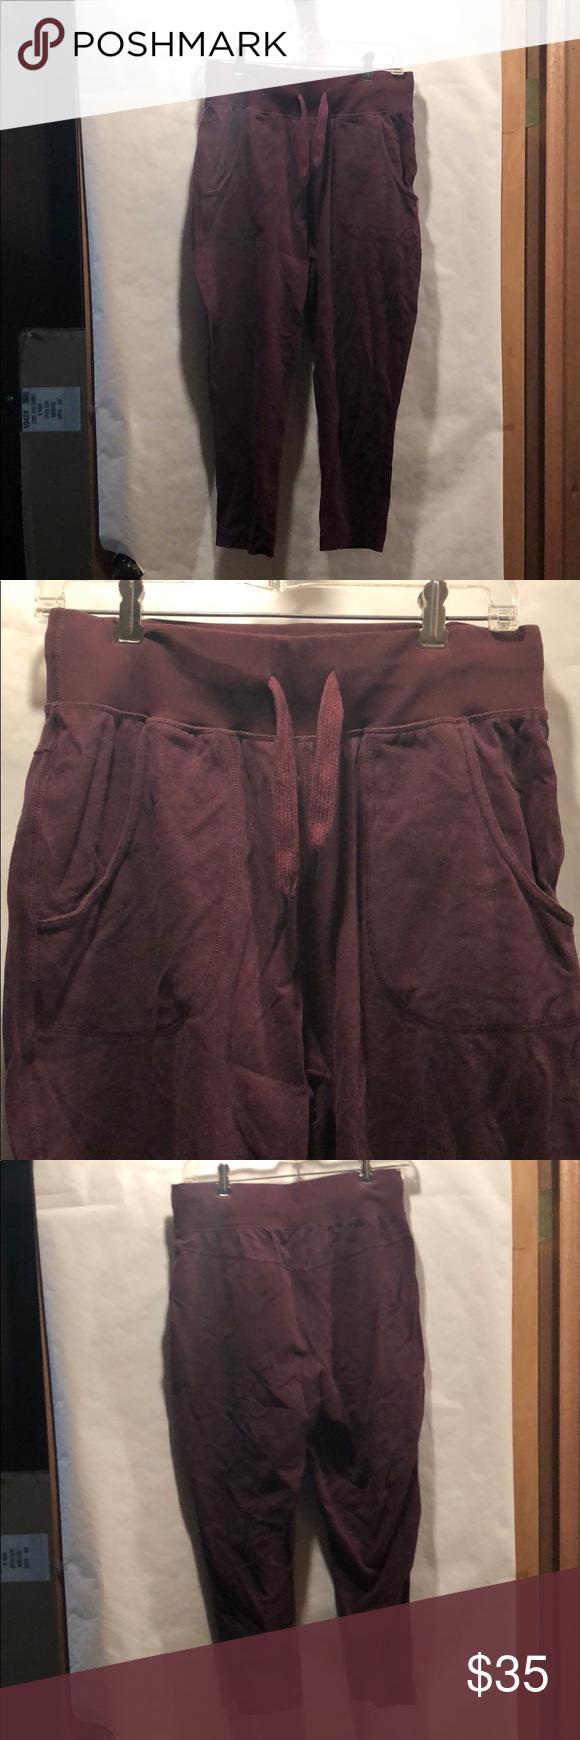 lululemon burgundy capri sweats these pants are so comfy too big